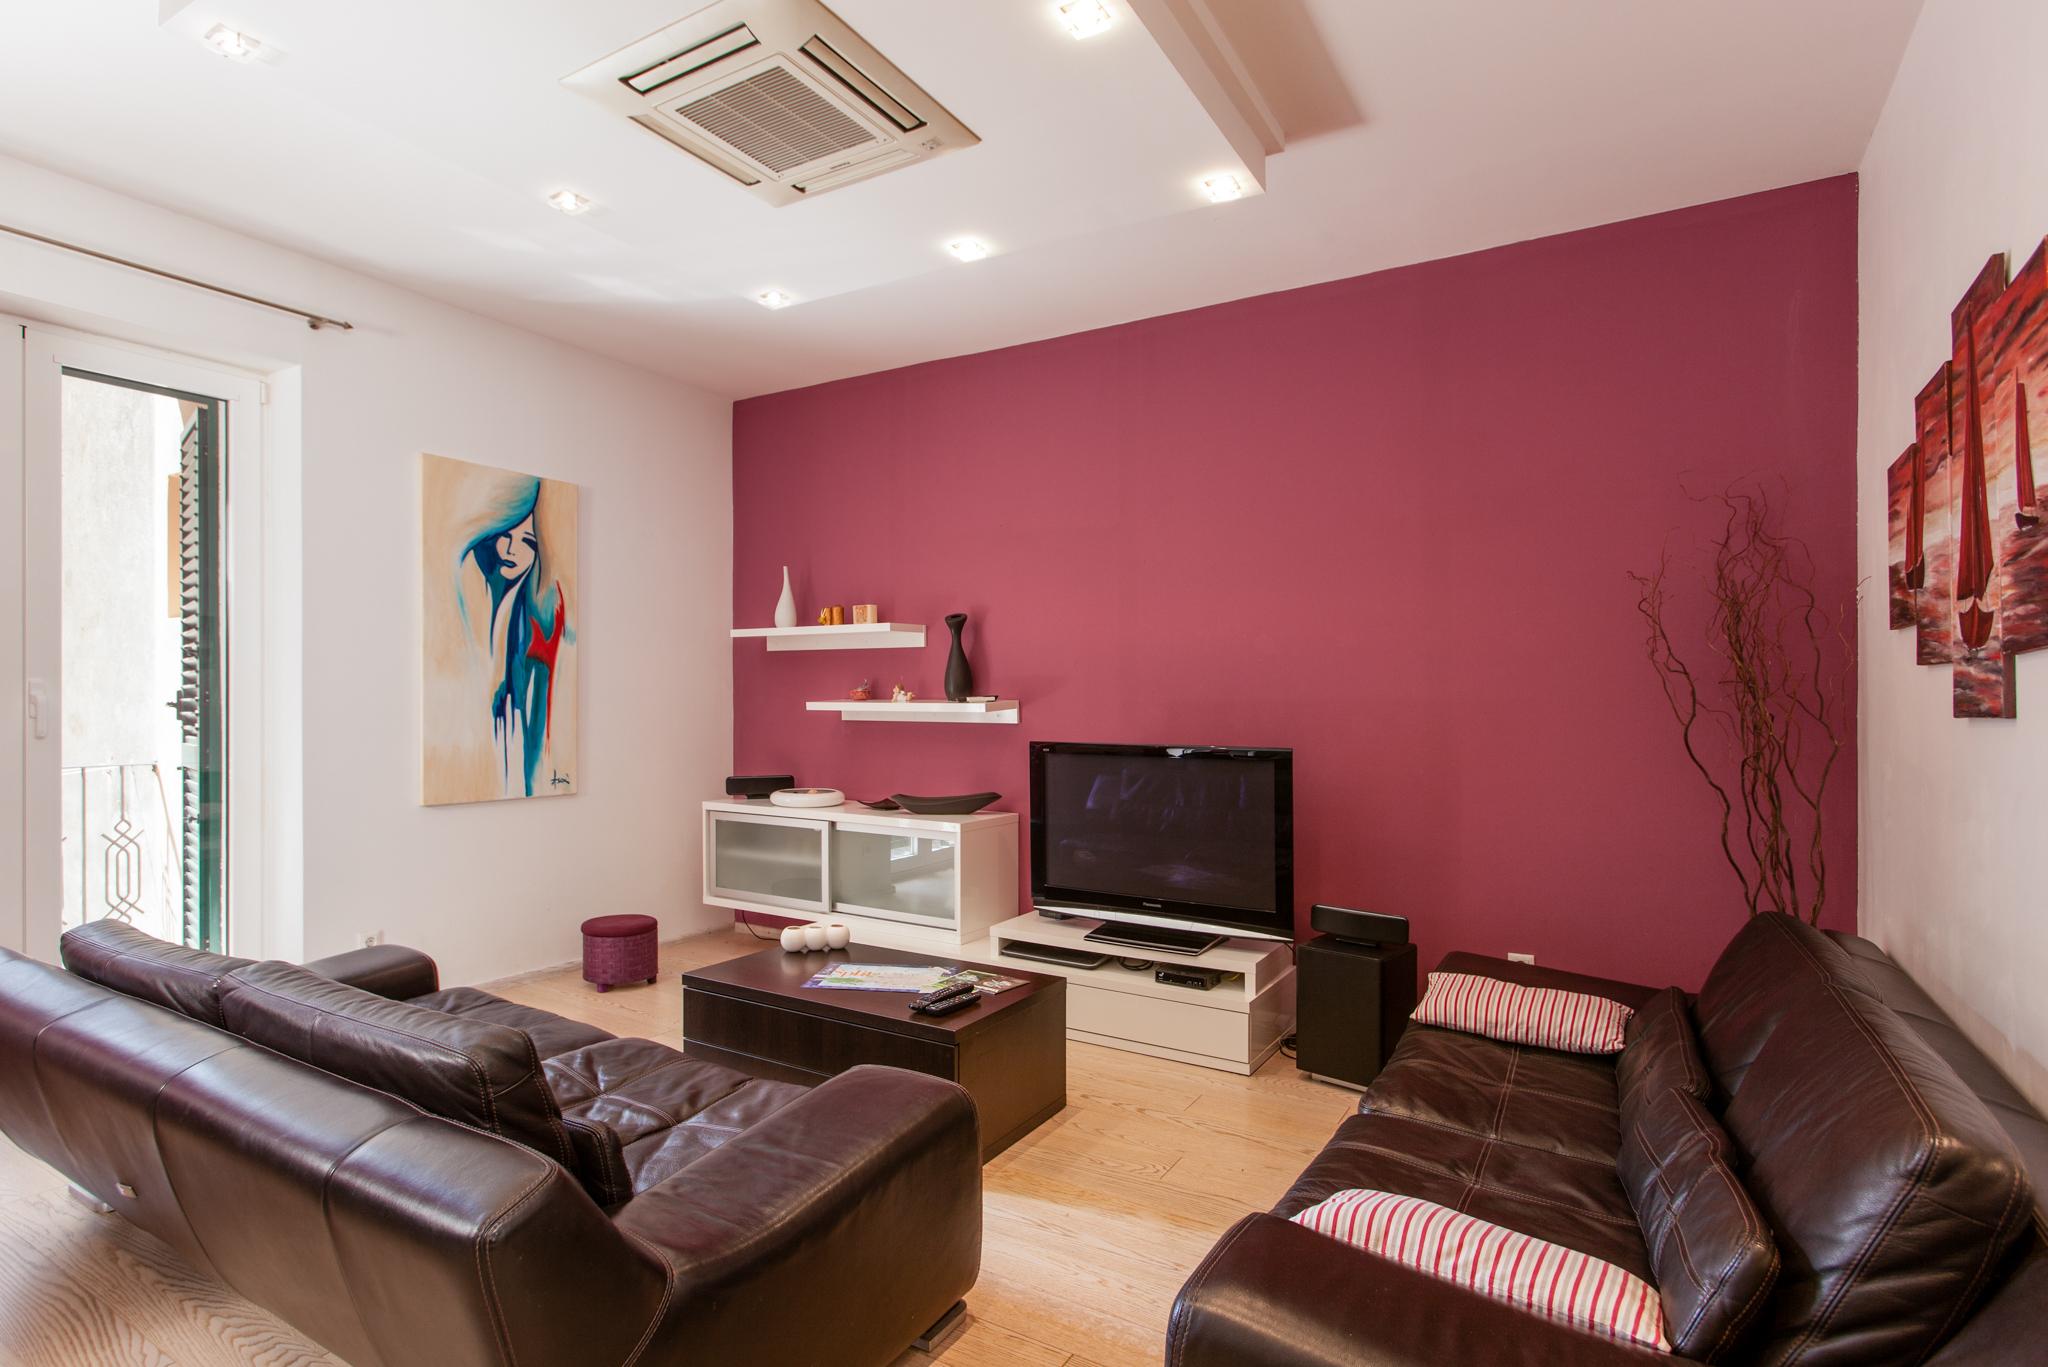 Apartment Split - Aspalathos (15)